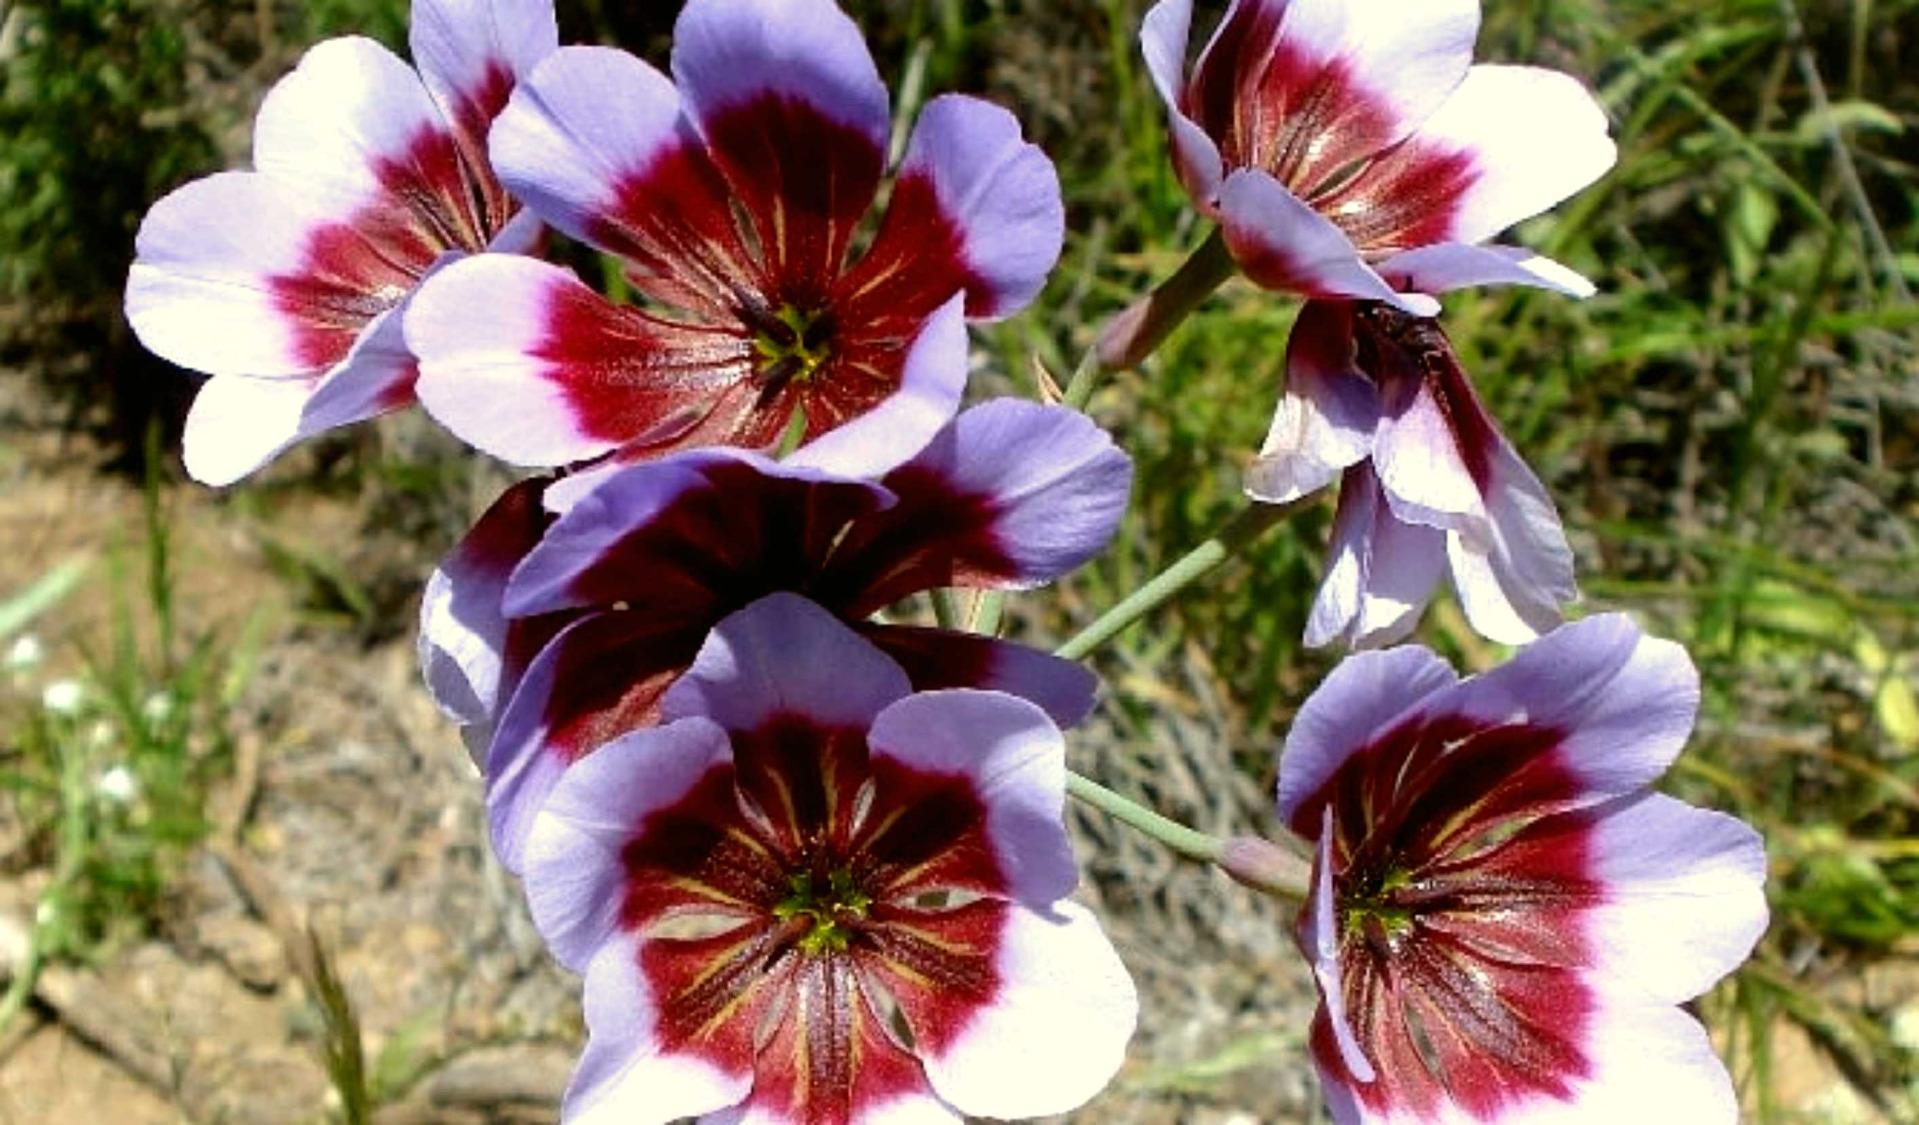 plantes couvre-sols melliferes - leaderplant